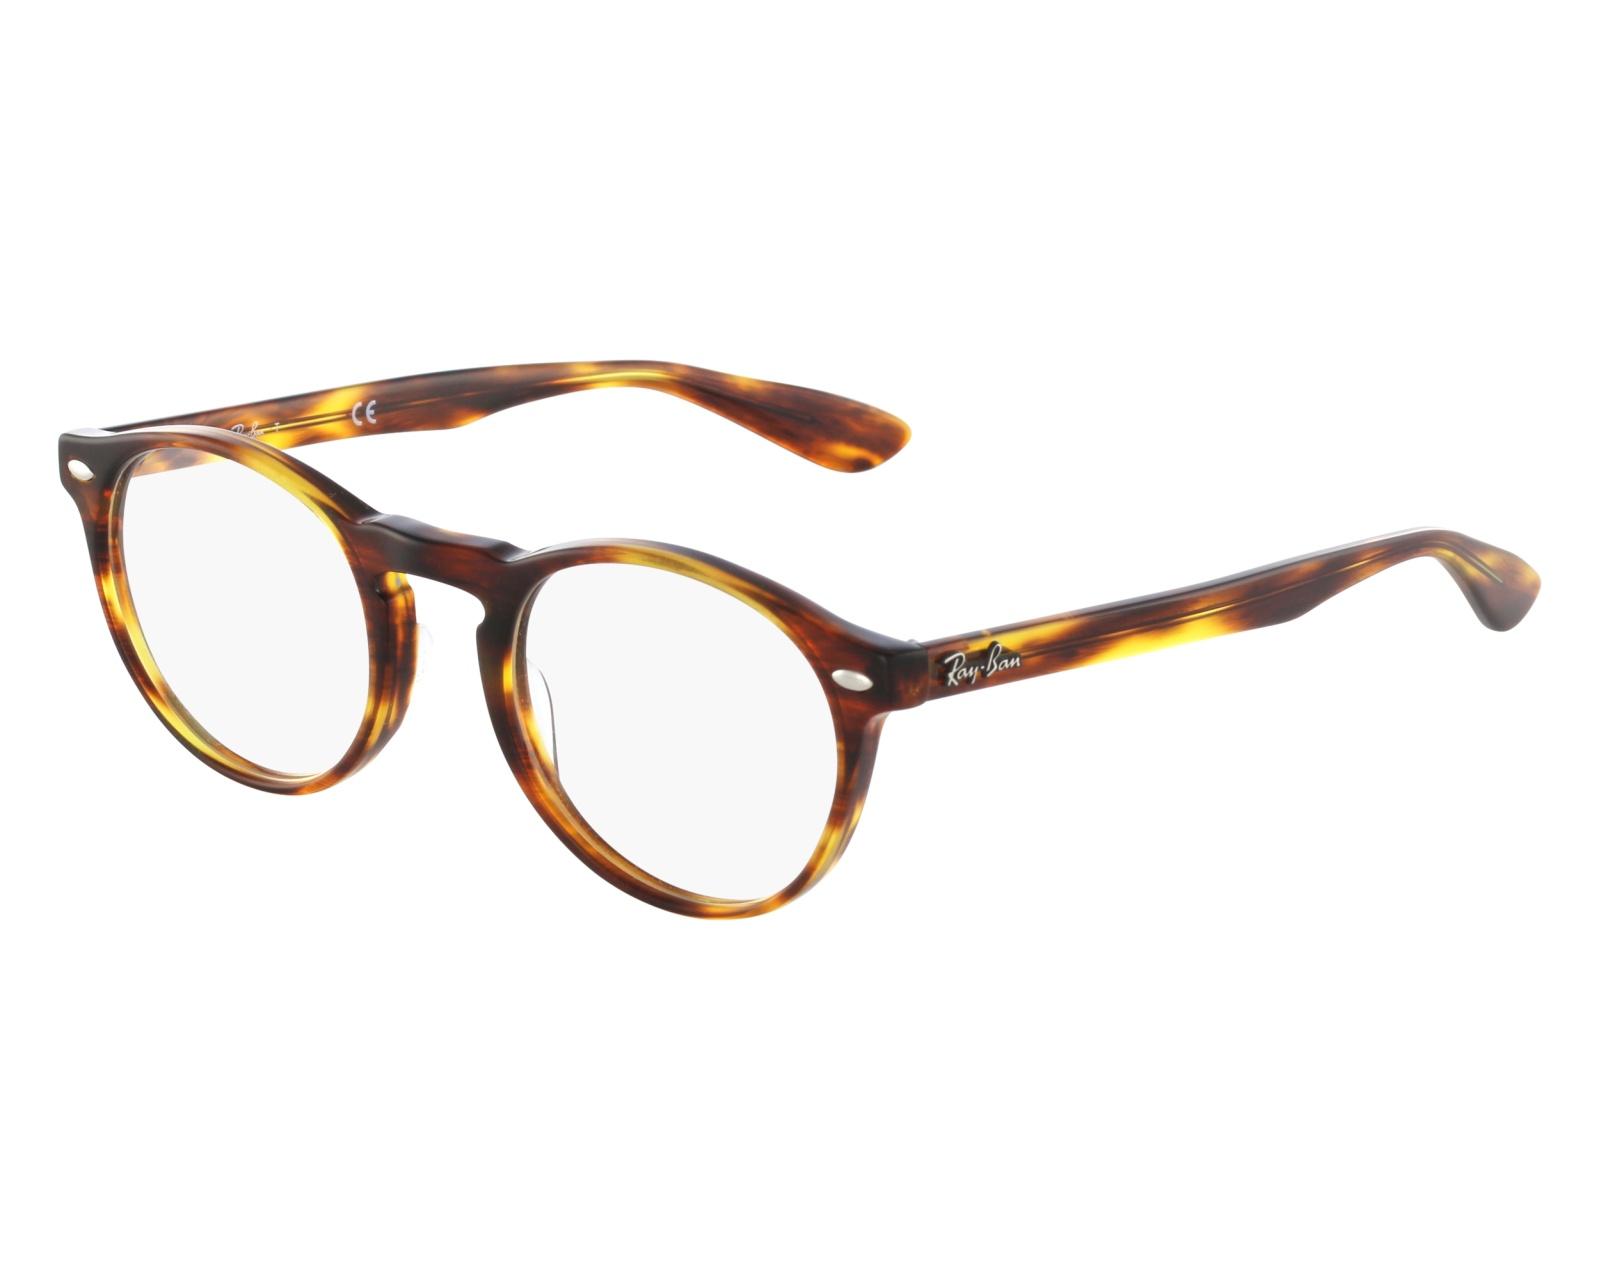 RAY BAN RAY-BAN Herren Brille » RX5283«, braun, 2144 - braun